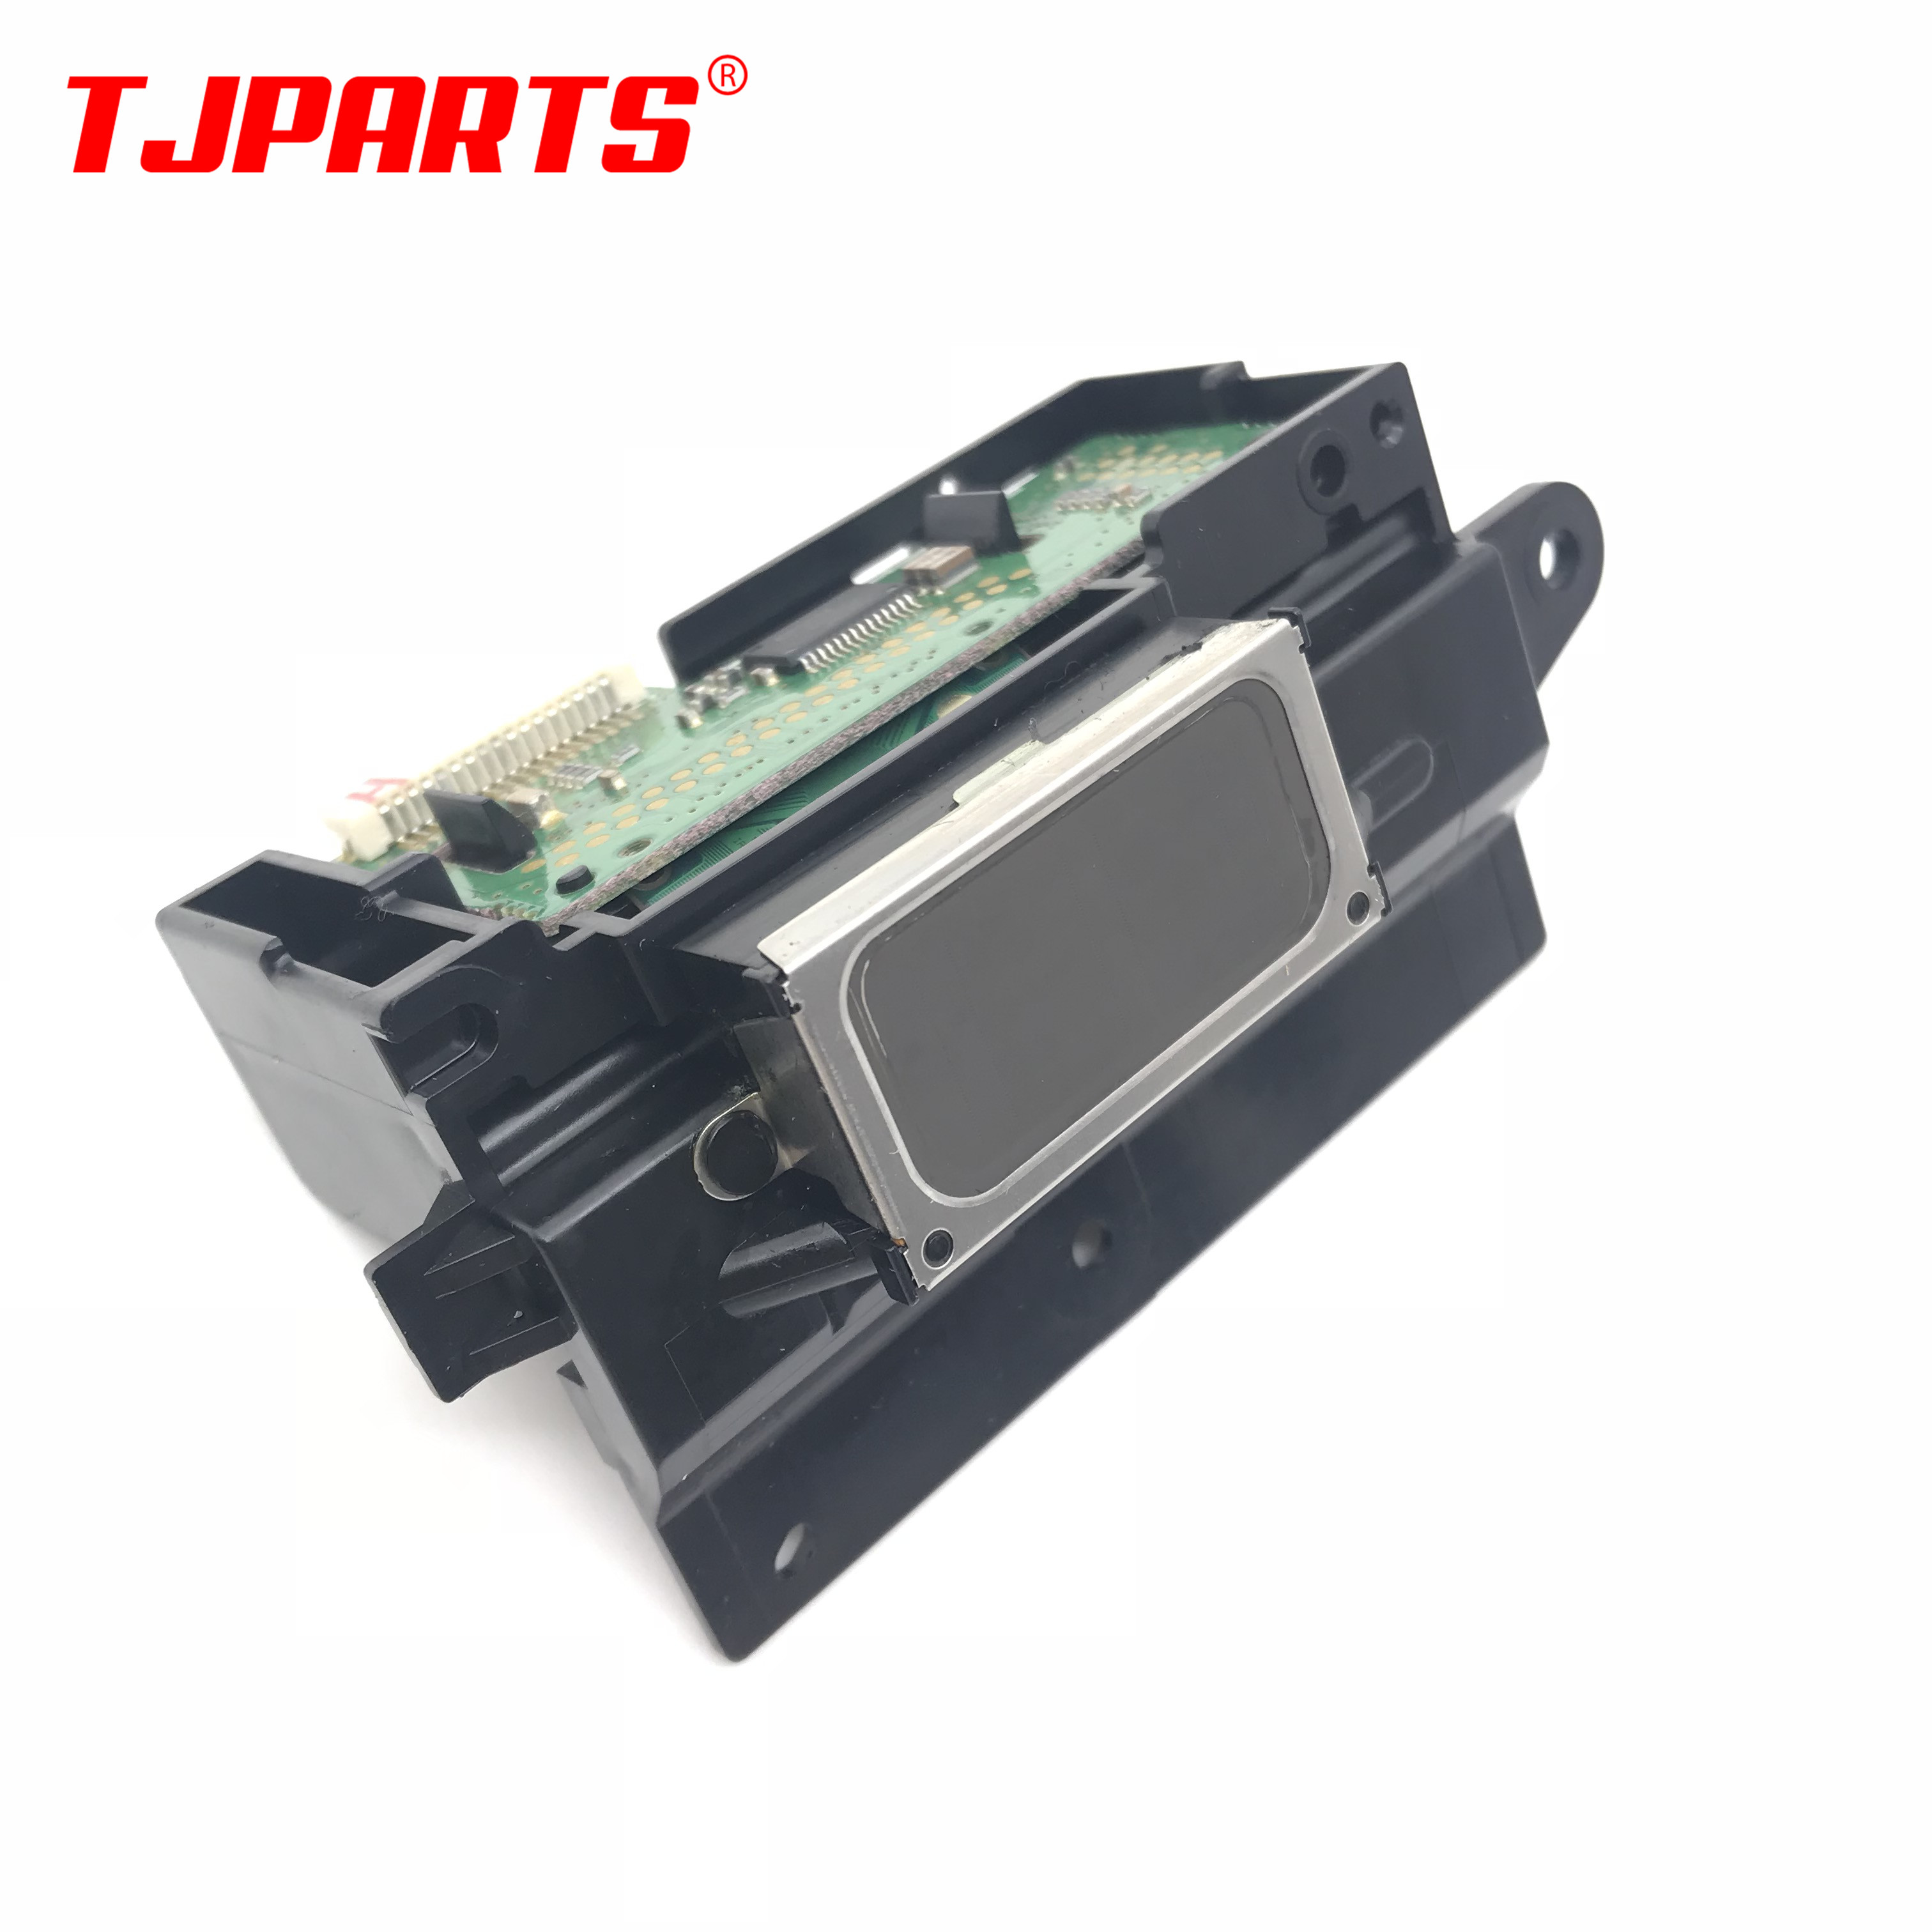 Image 2 - F083000 F083030 Printhead Printer Print Head for Epson Stylus  Photo 790 890 895 1290 1290S 915 900 880Printer Parts